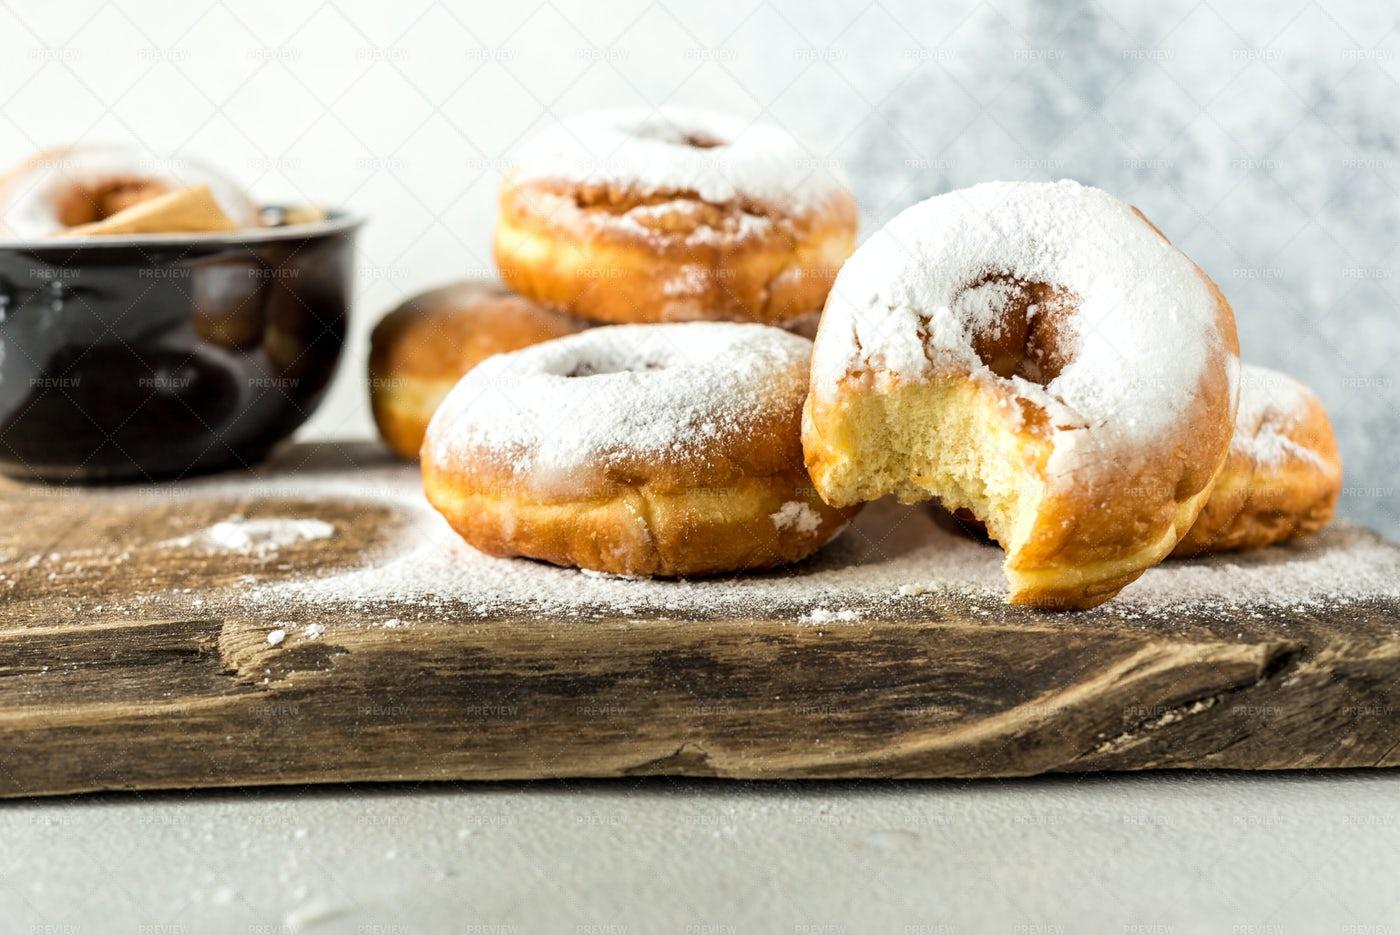 Homemade Sugared Donuts: Stock Photos